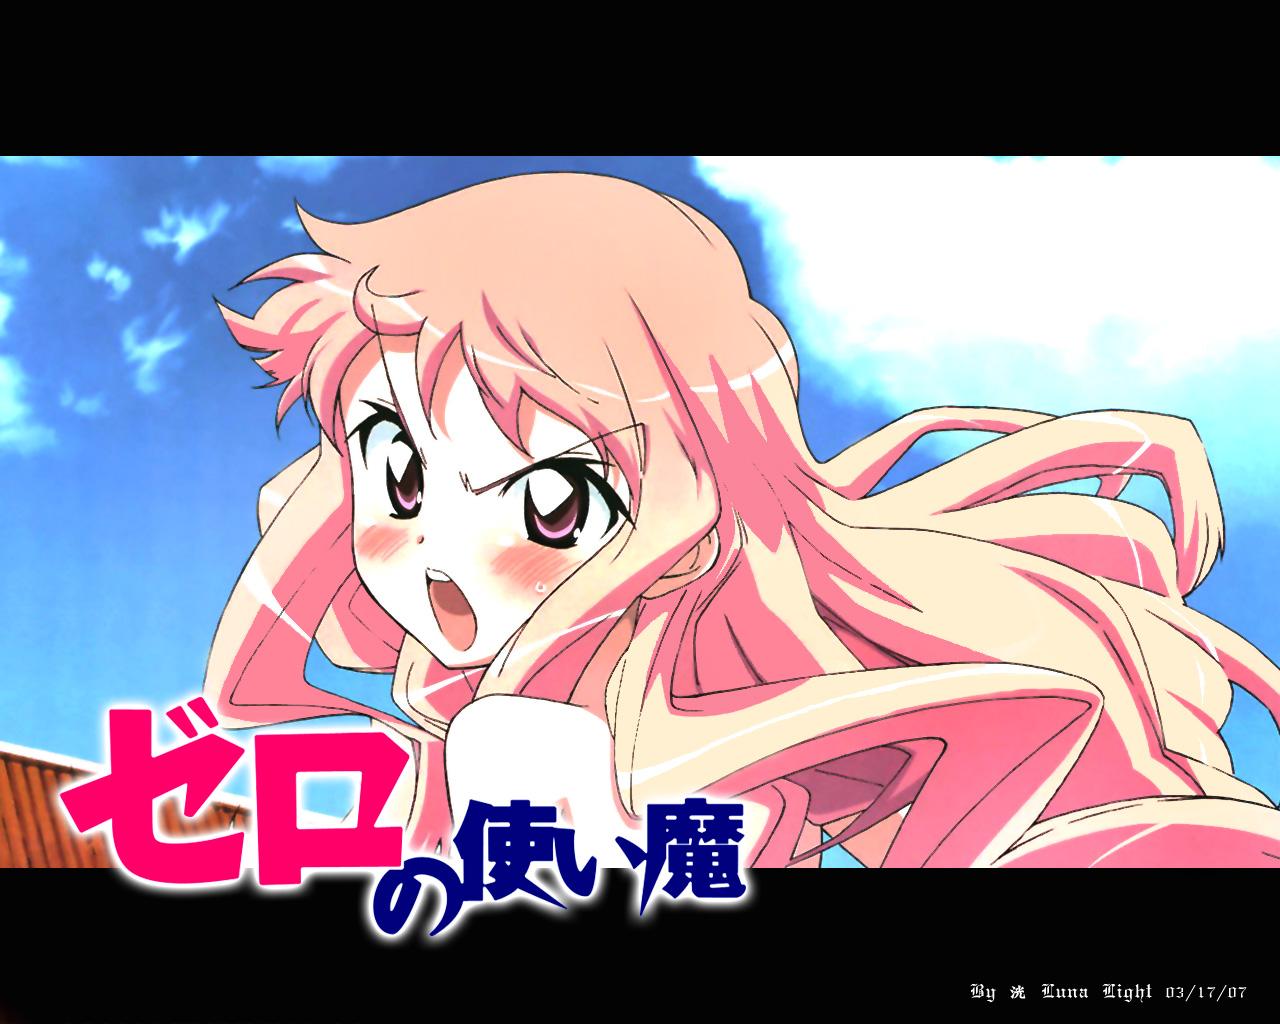 zeroNoTsukaimaSaison3_wallpaper_5838.jpg